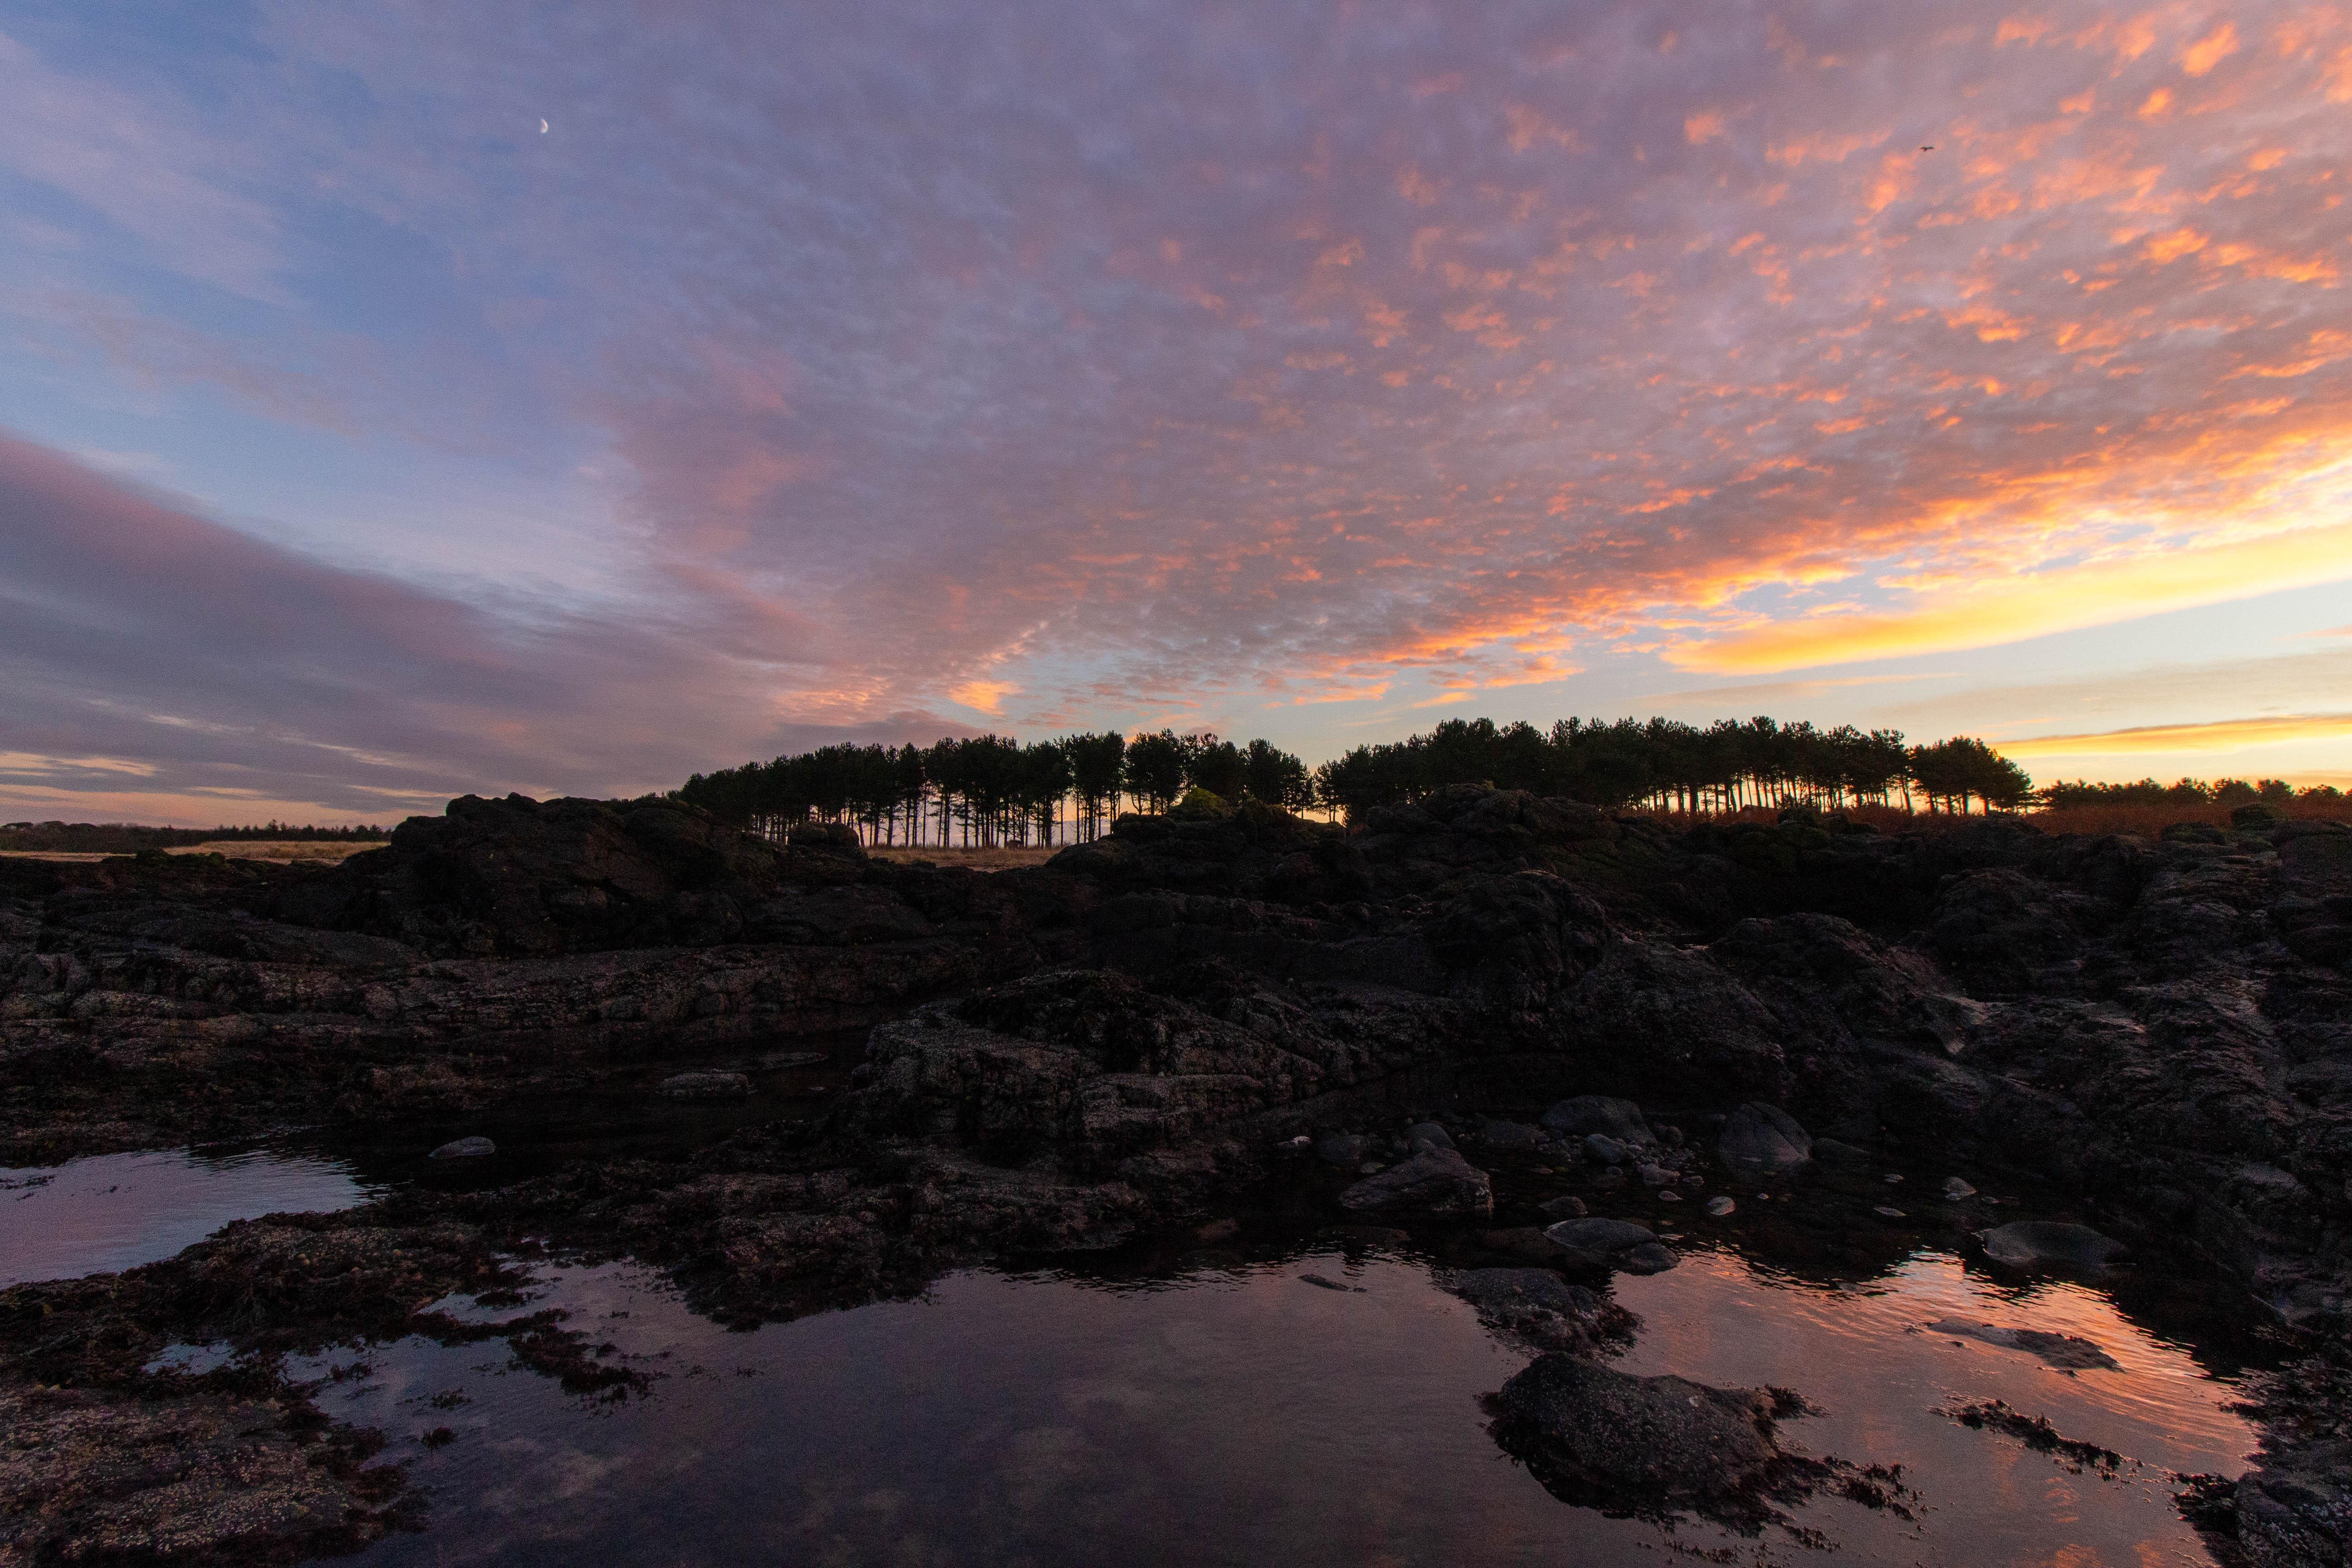 Purple sunset at Yellowcraig Beach, East Lothian